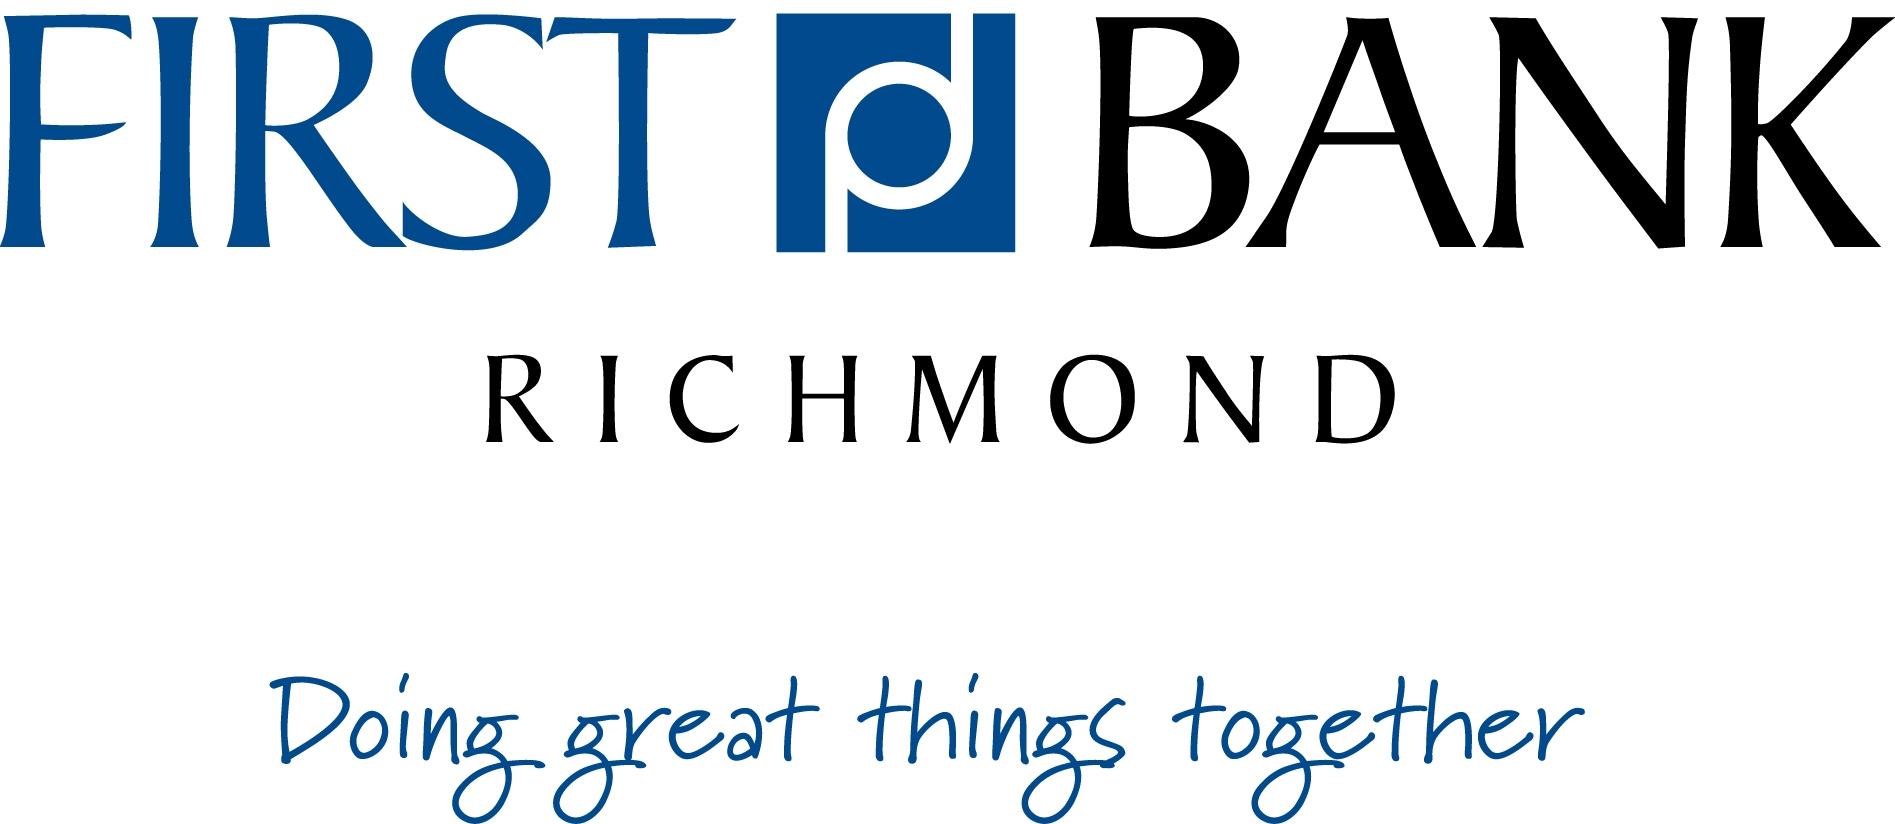 first-bank-richmond-logo-1.jpg